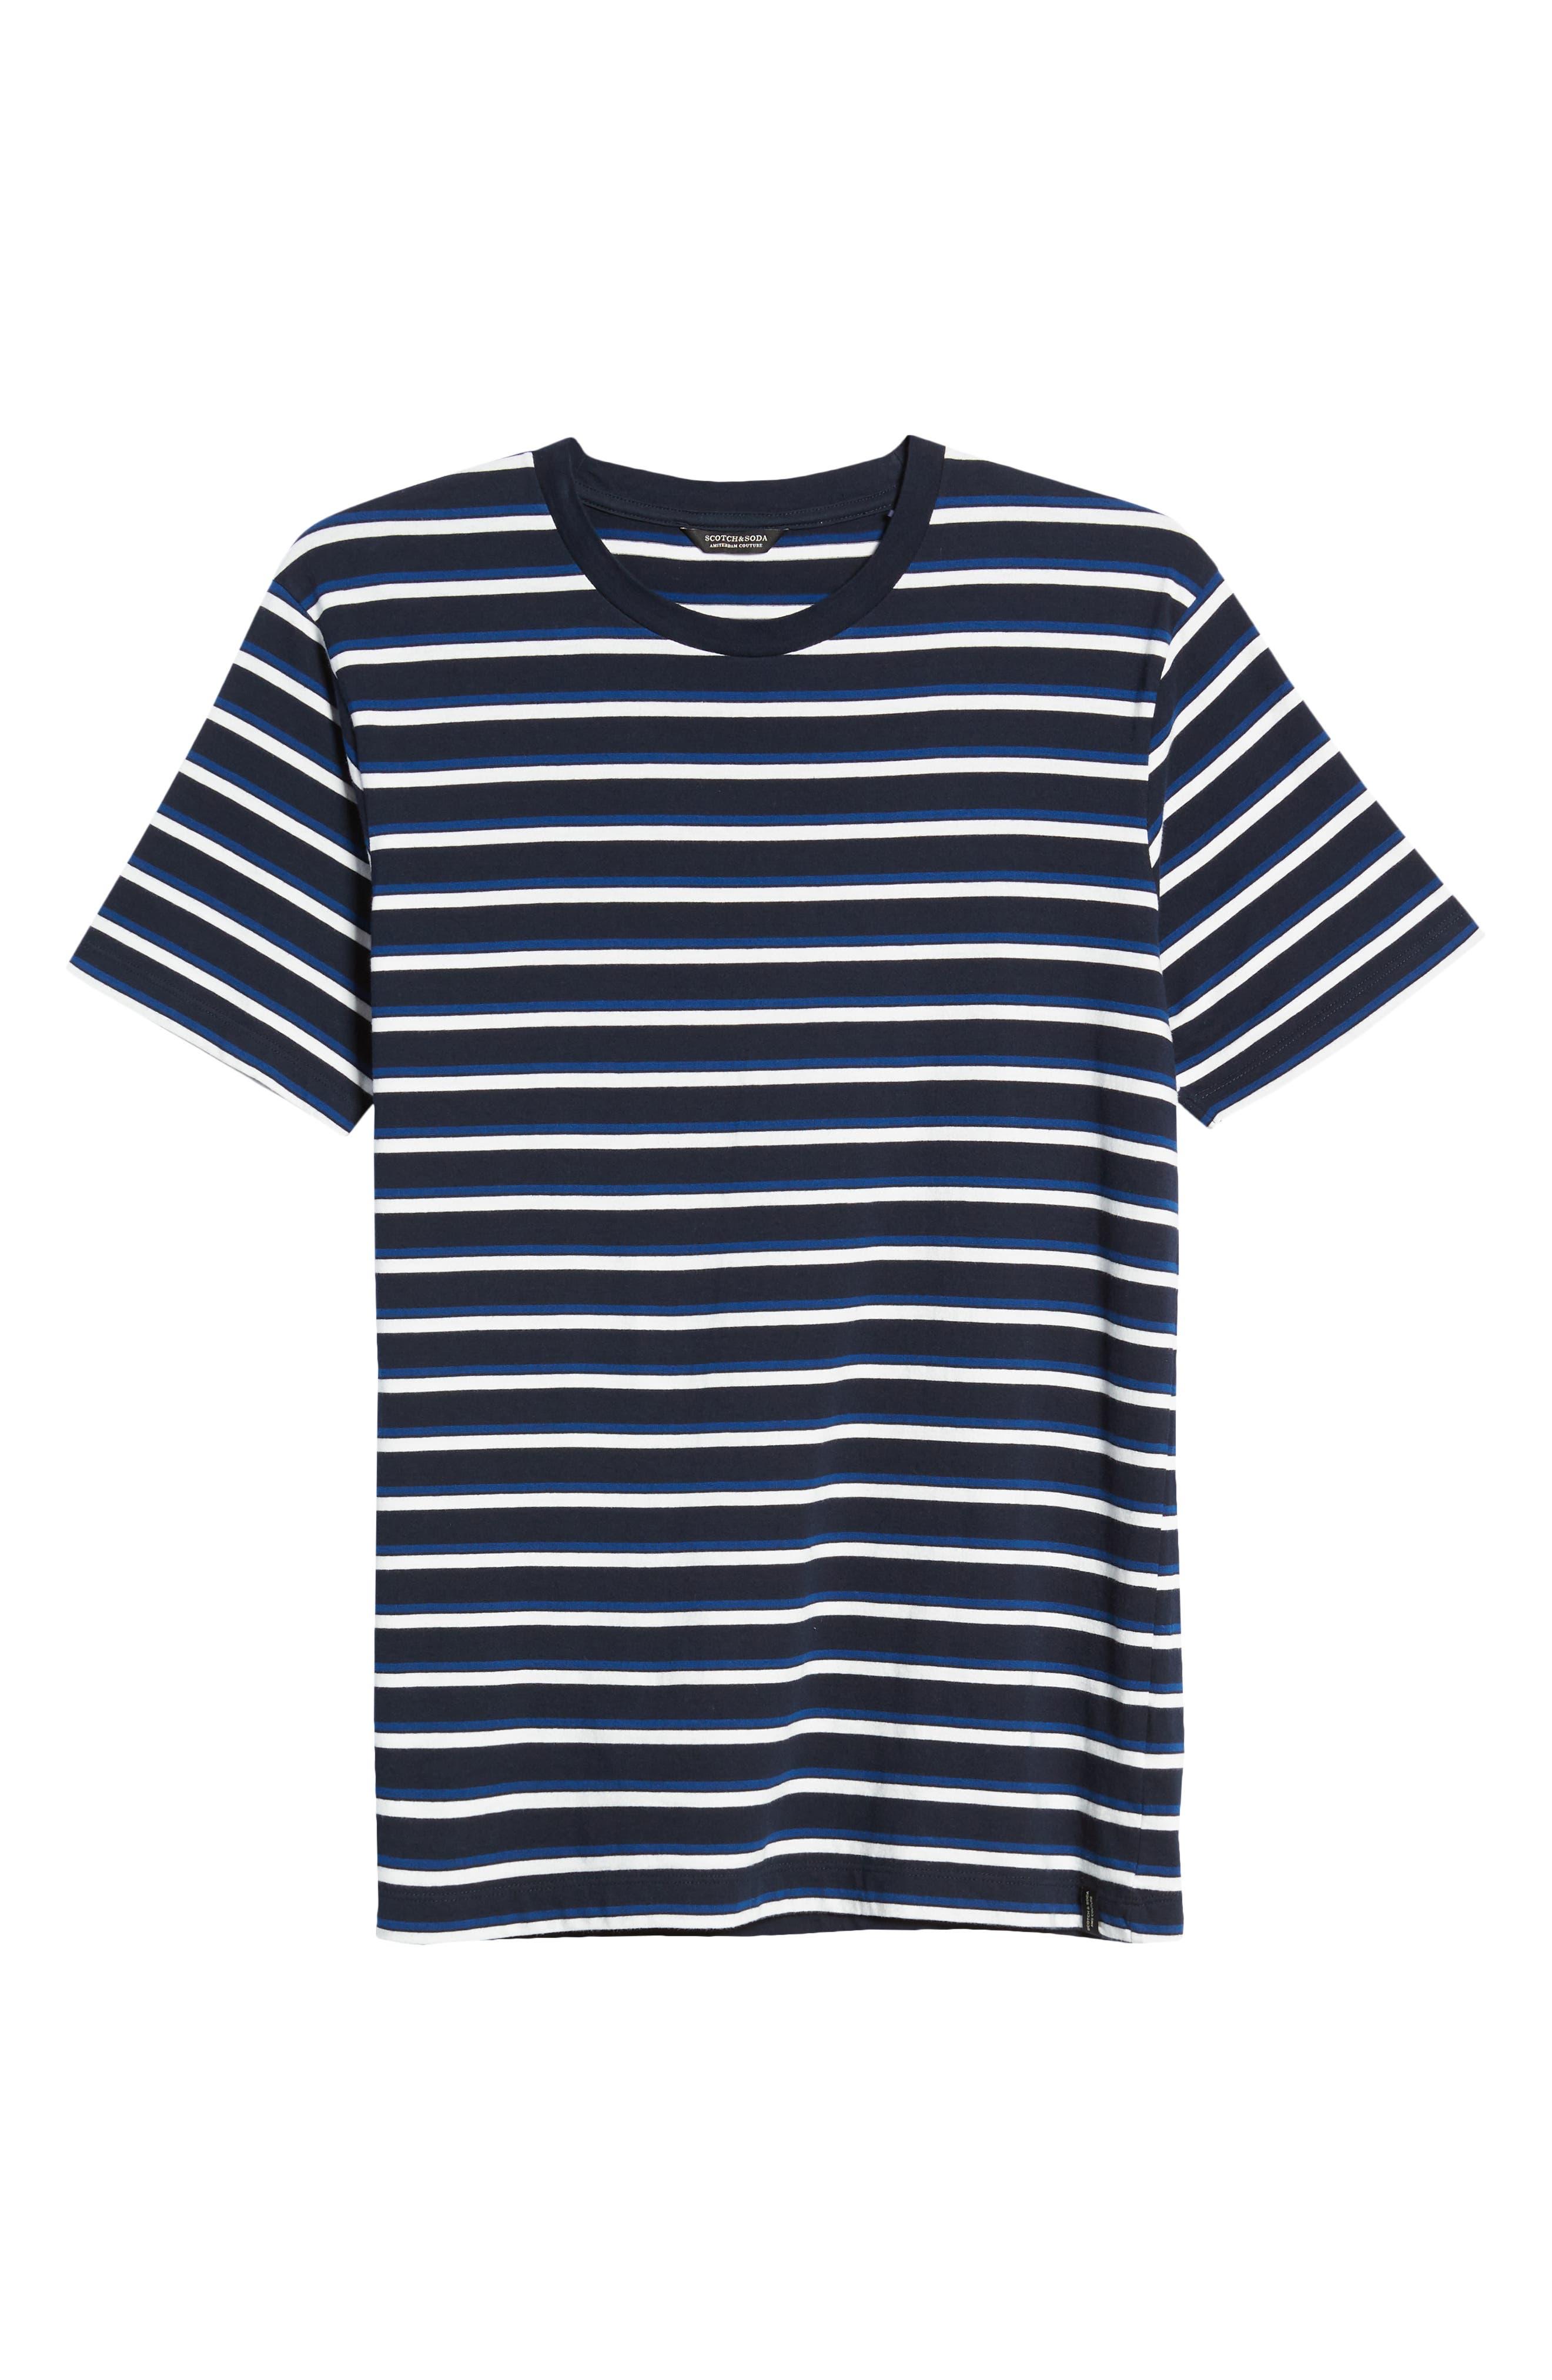 1930s Men's Clothing SCOTCH AND SODA Longline Crewneck T-Shirt Size Large Us in Blue Stripe at Nordstrom Rack $24.97 AT vintagedancer.com